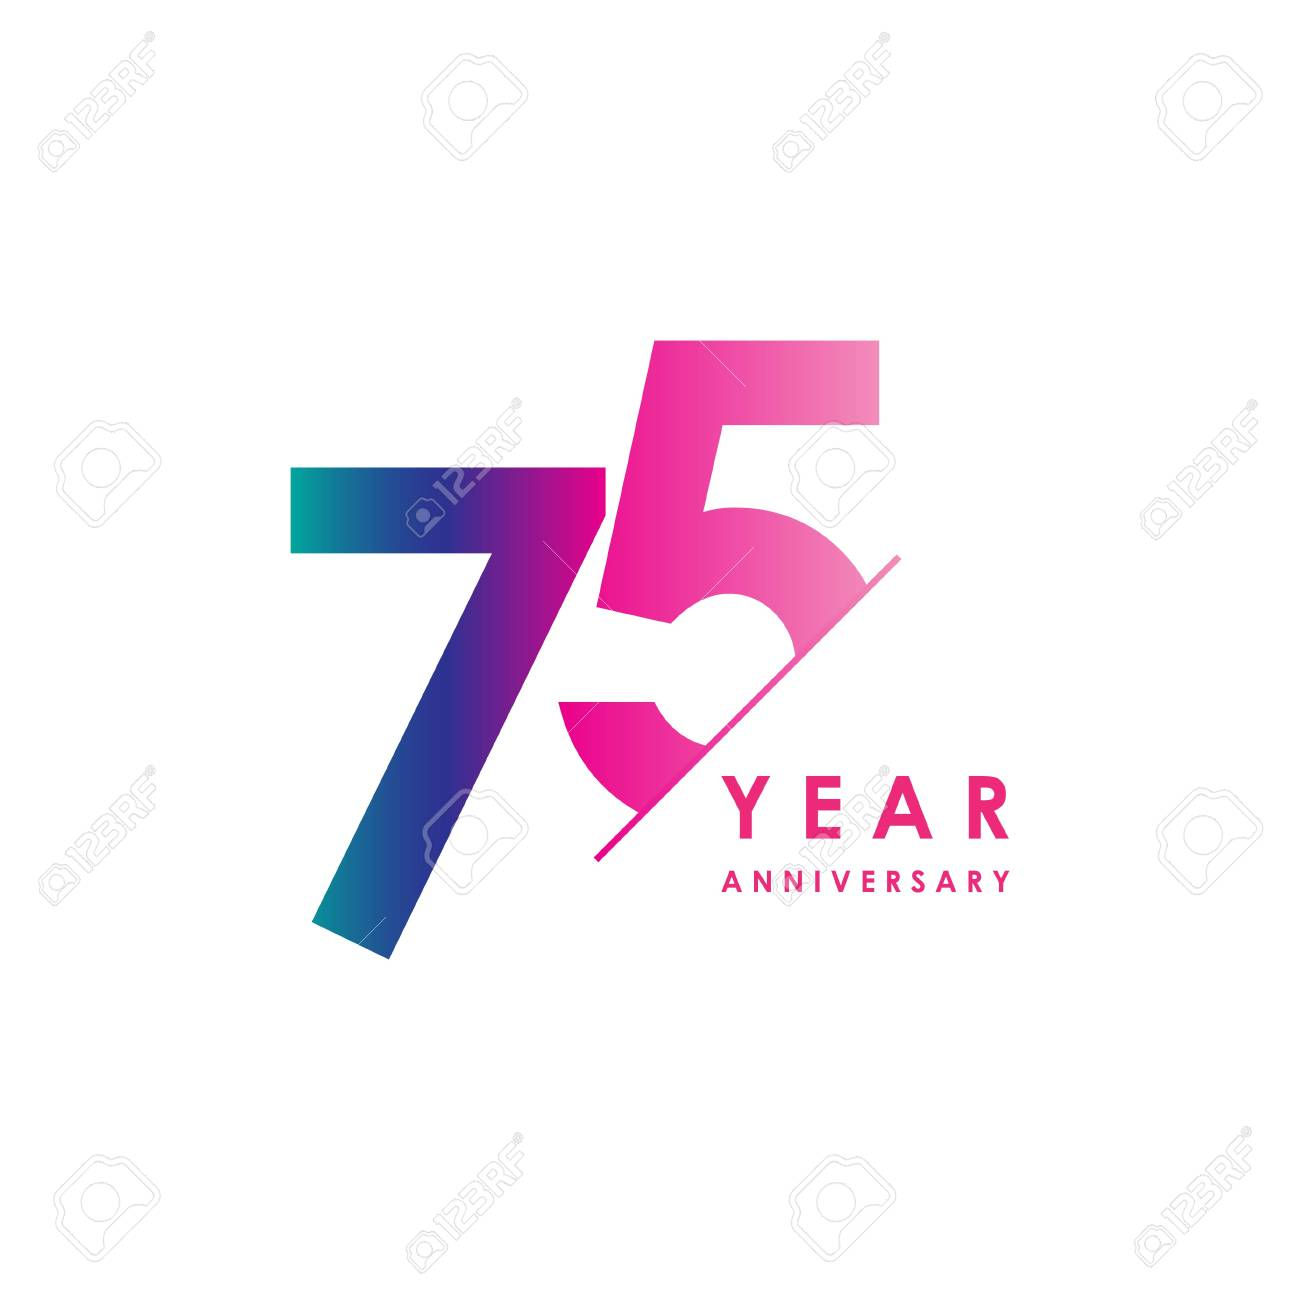 75 Year Anniversary Vector Template Design Illustration - 119347807